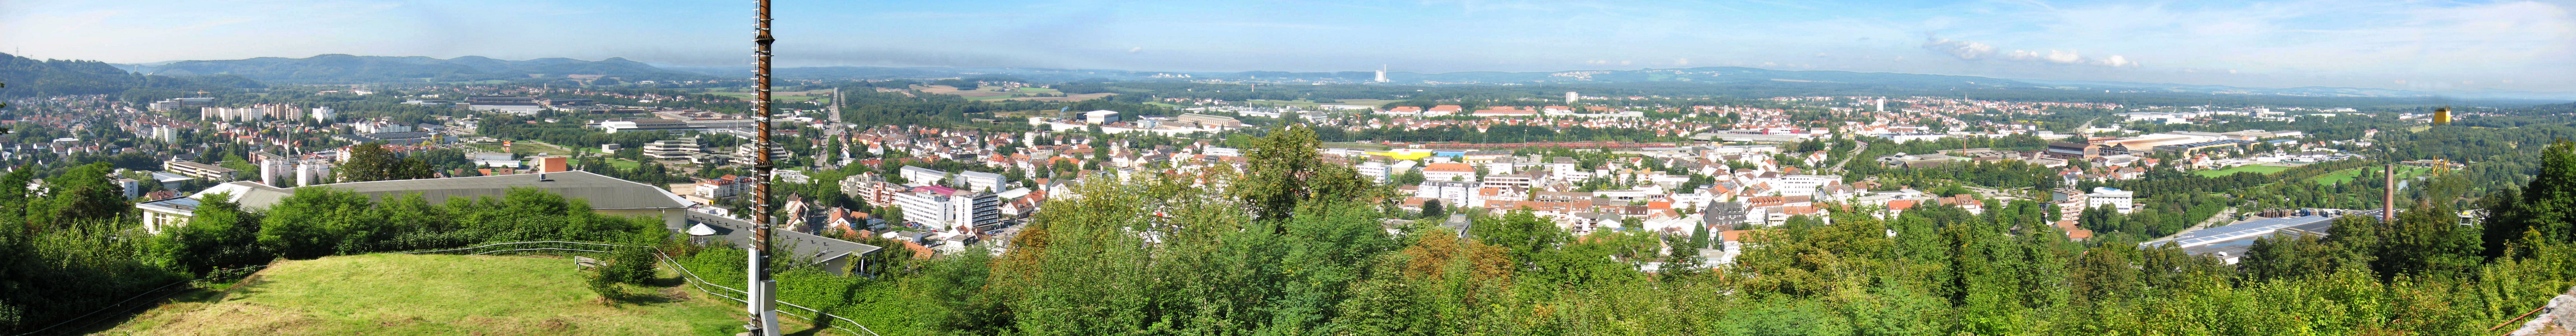 Best singlebörse Saarland